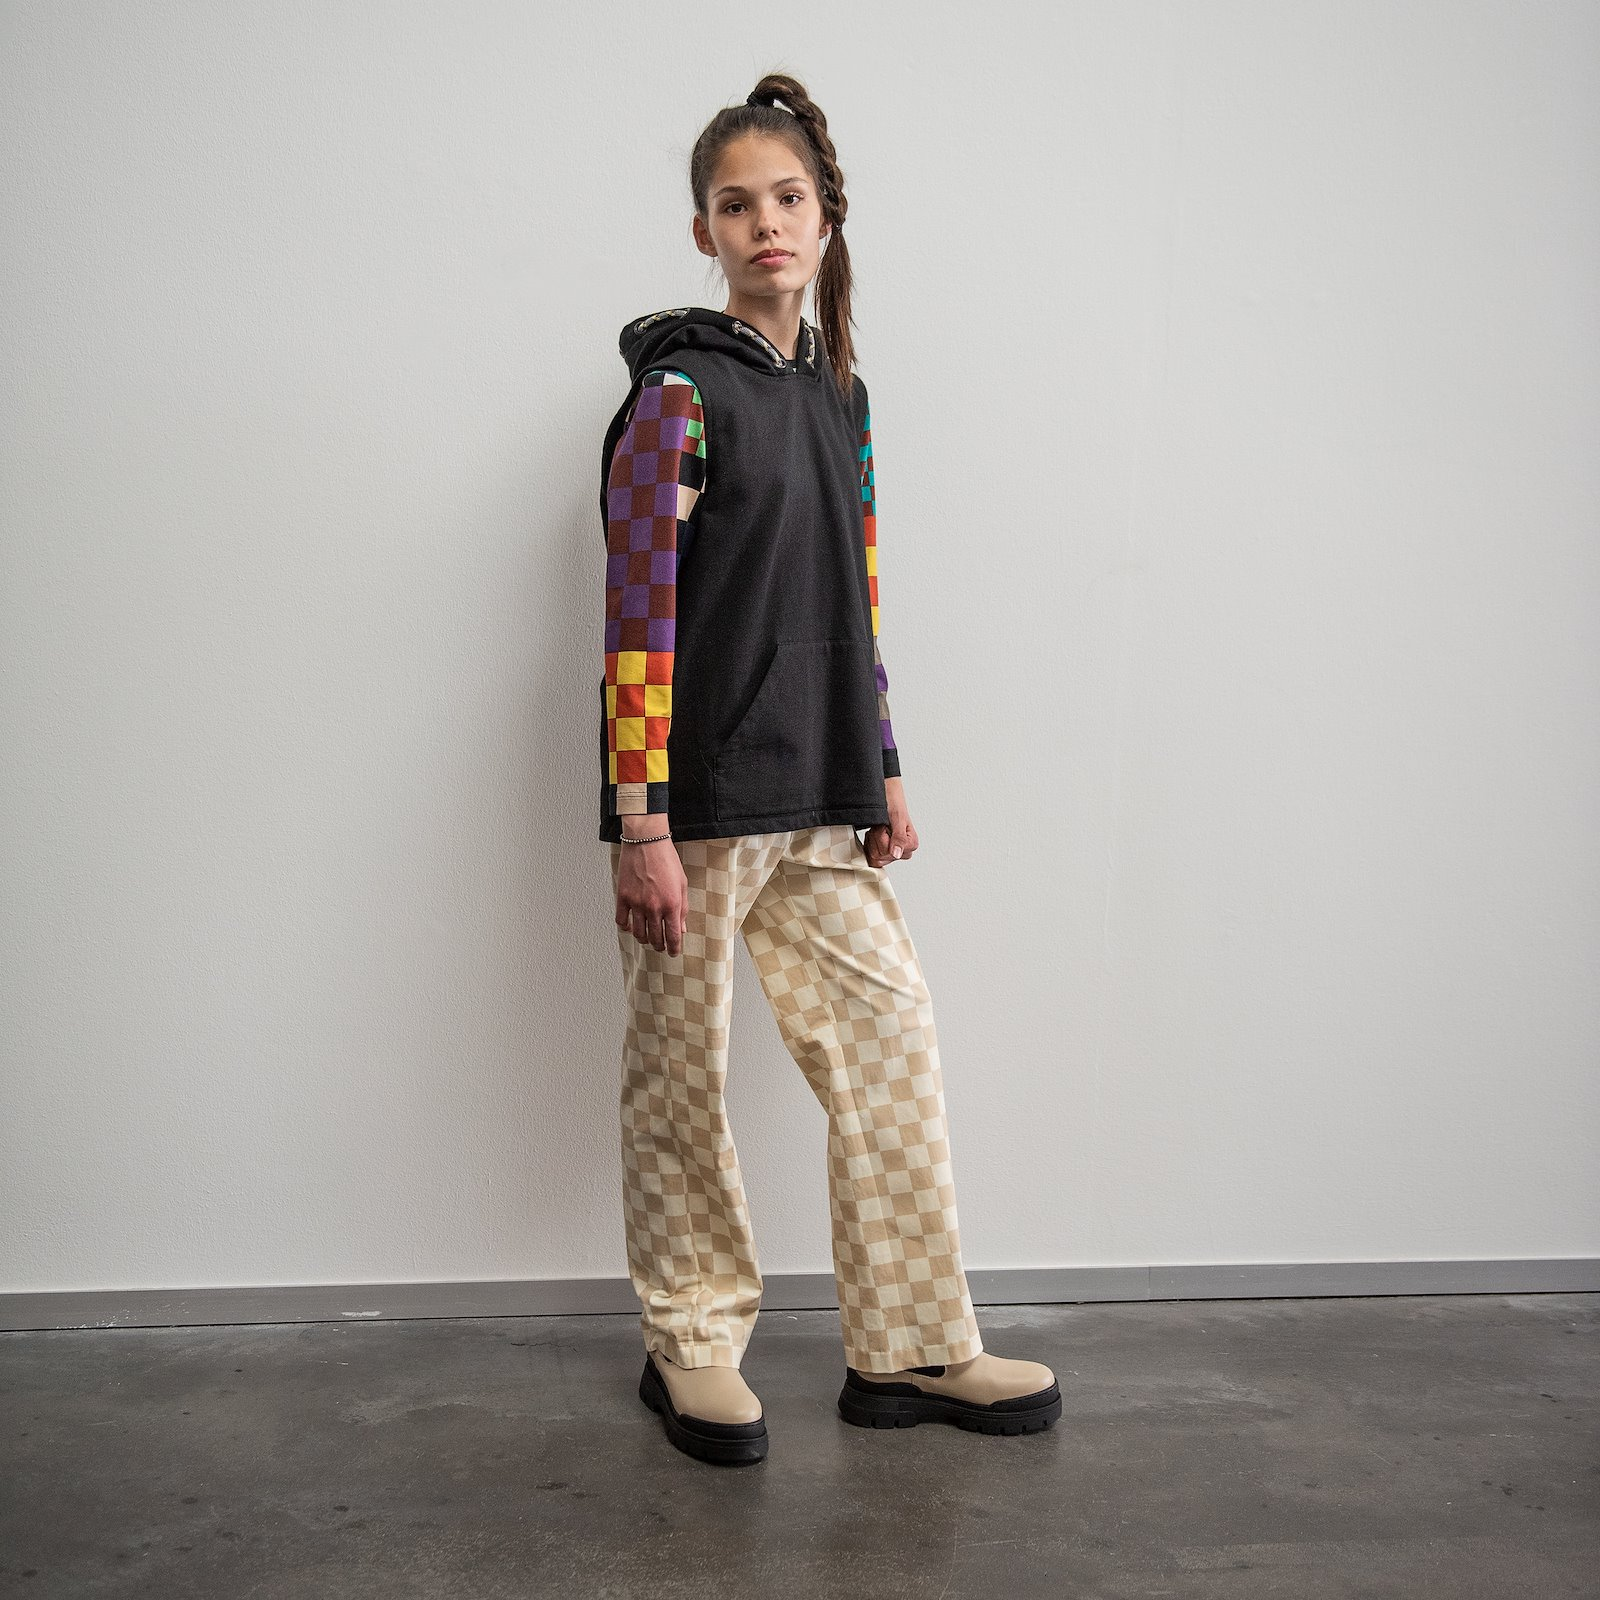 High waist and wide lege trouser, 152/12 p62021_211759_230638_43690_22276_p62017_272807_p60034_420420_sskit